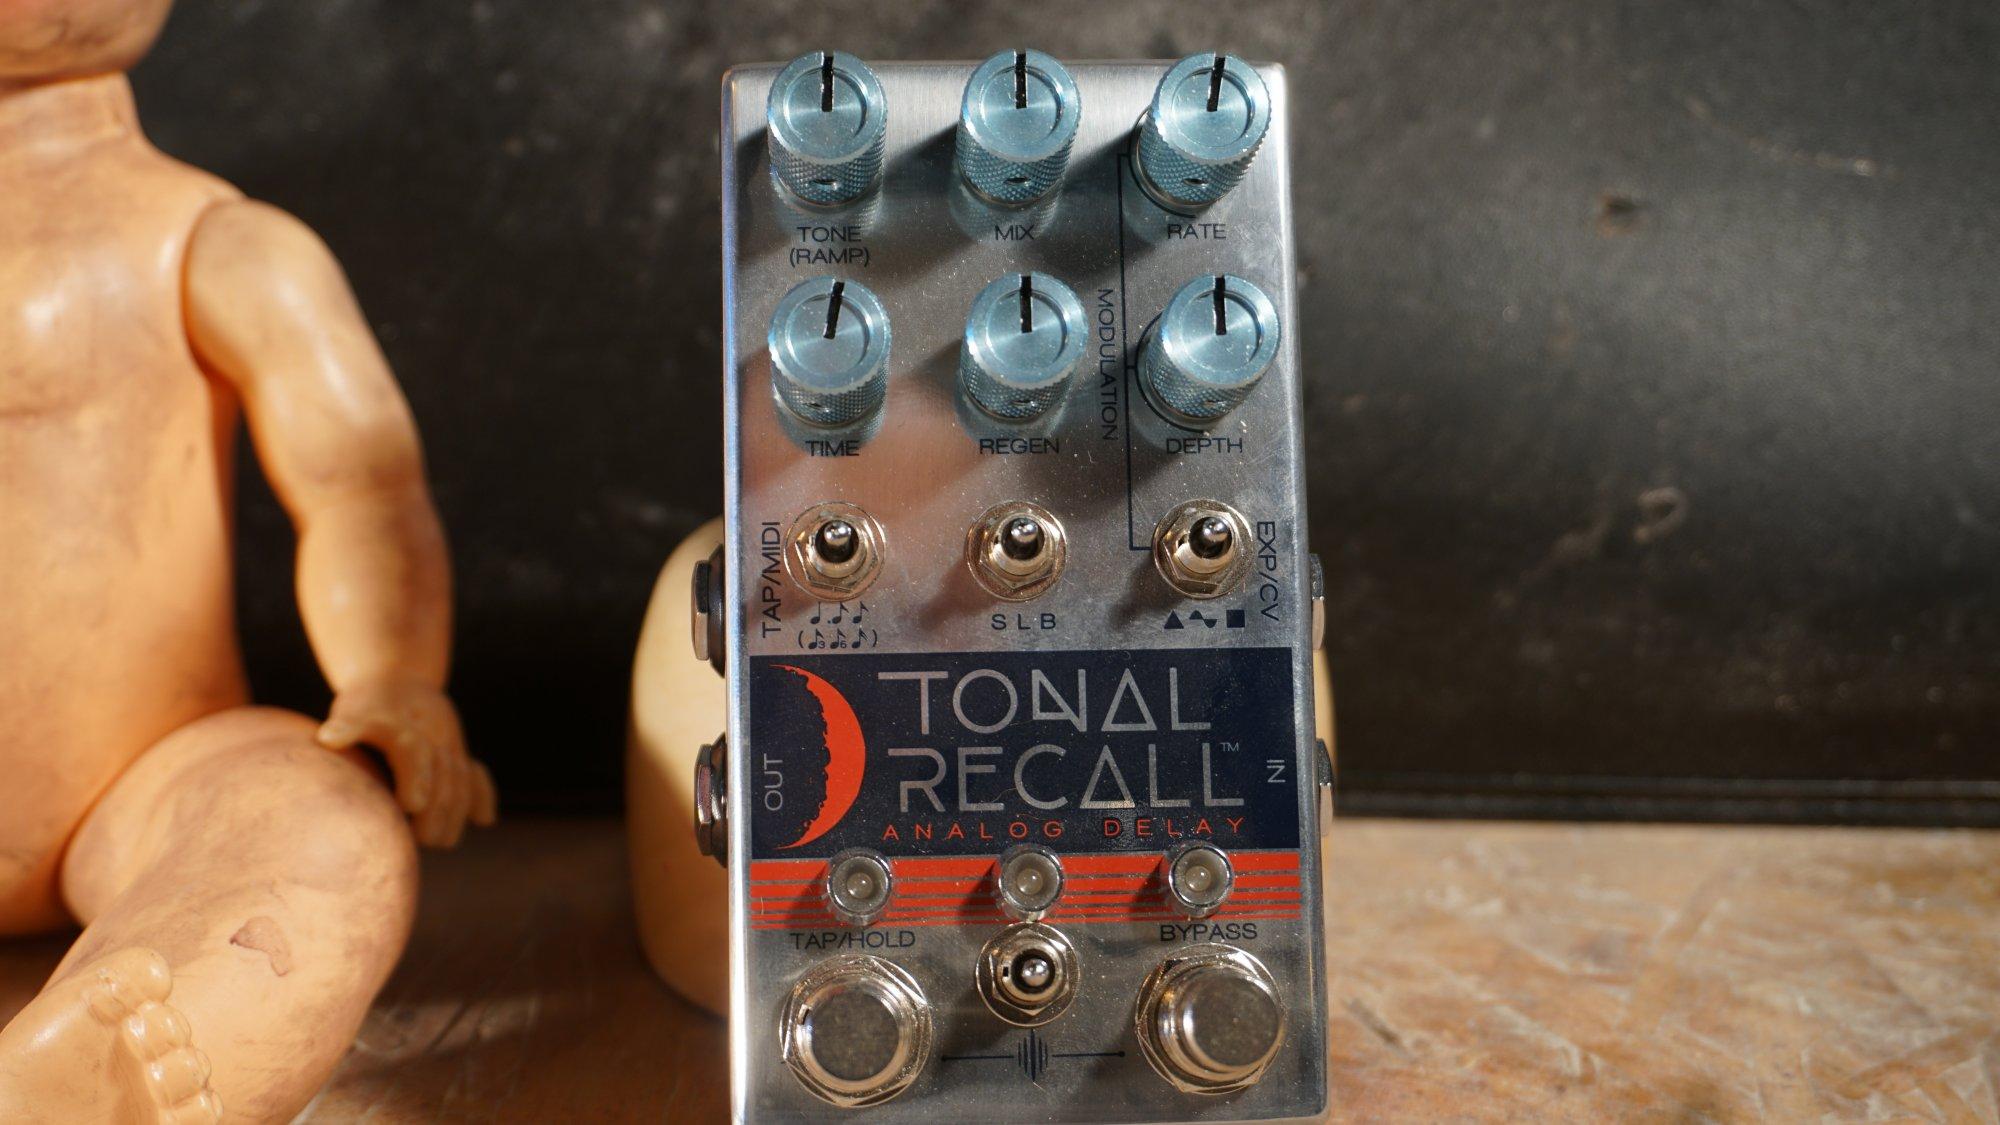 Tonall Recall